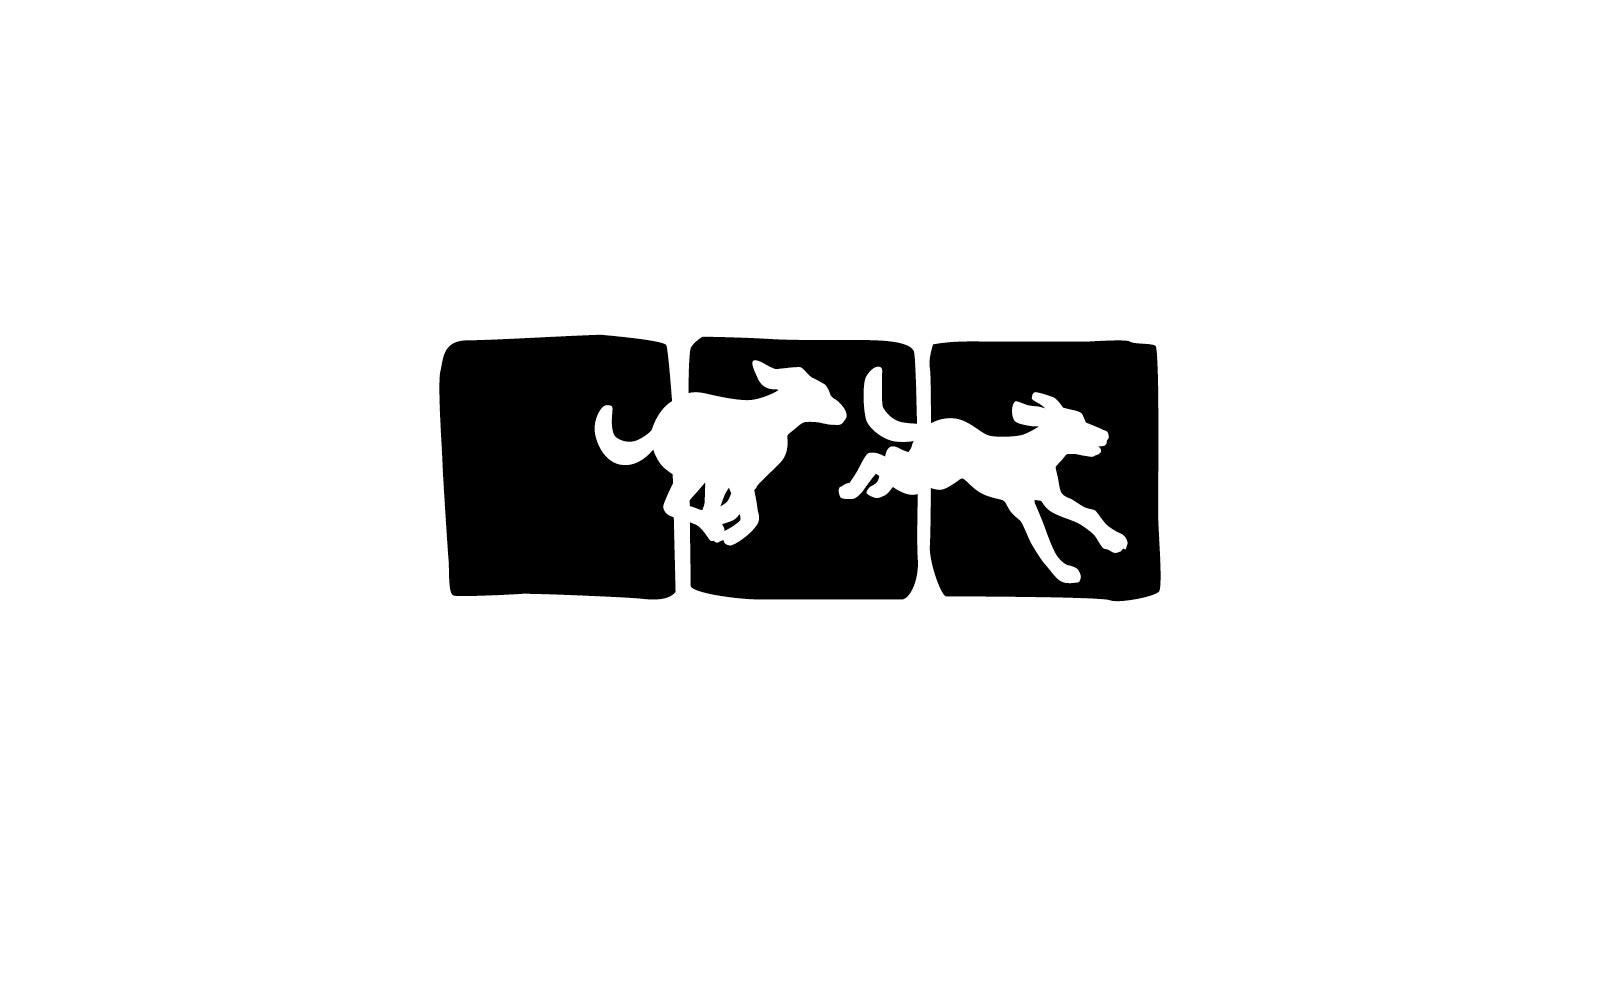 grafiksalon_logos_1600x1000_07